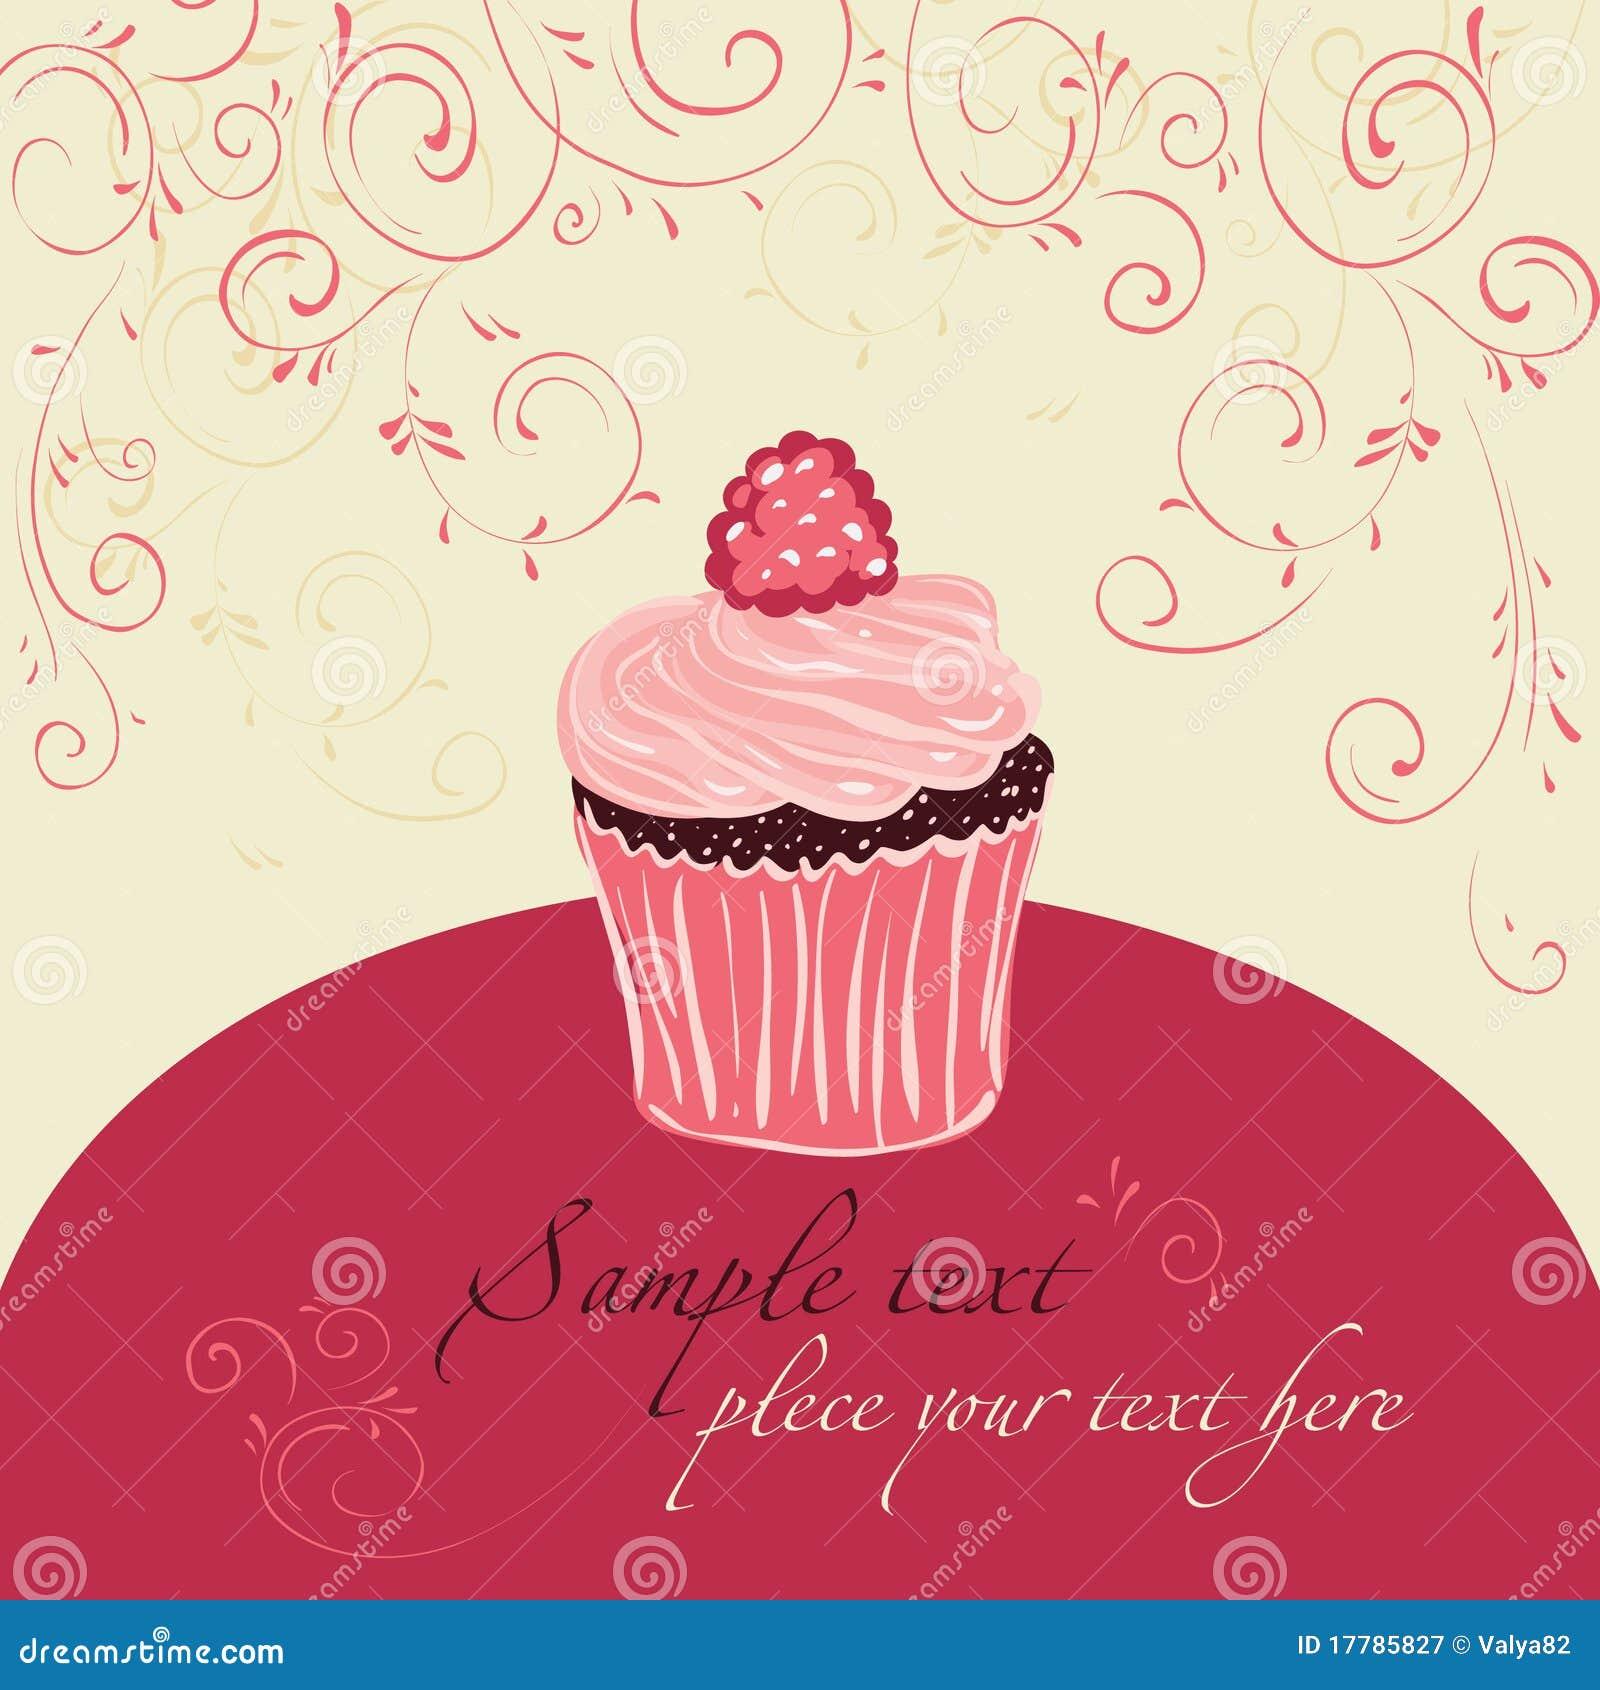 Happy Birthday Marcos Cake